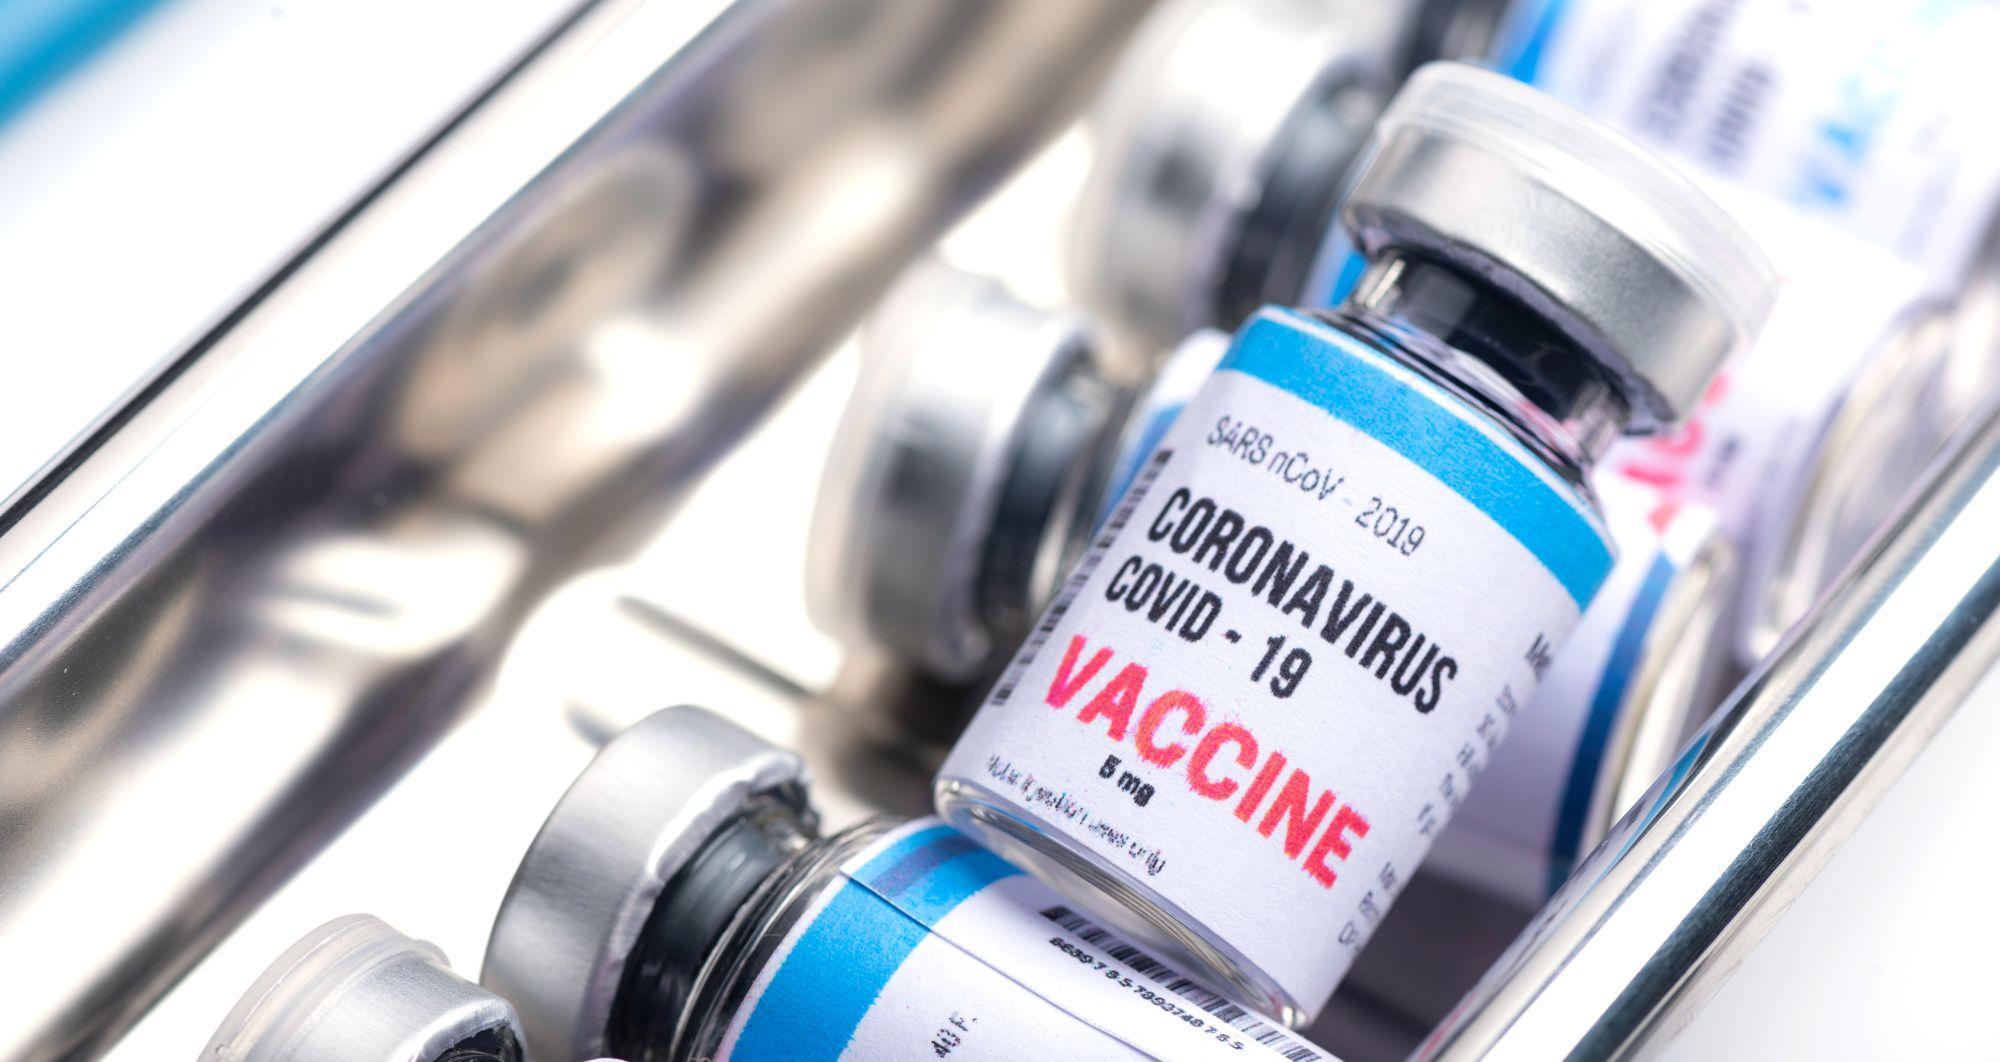 Covid Vaccine Stock photos by Vecteezy